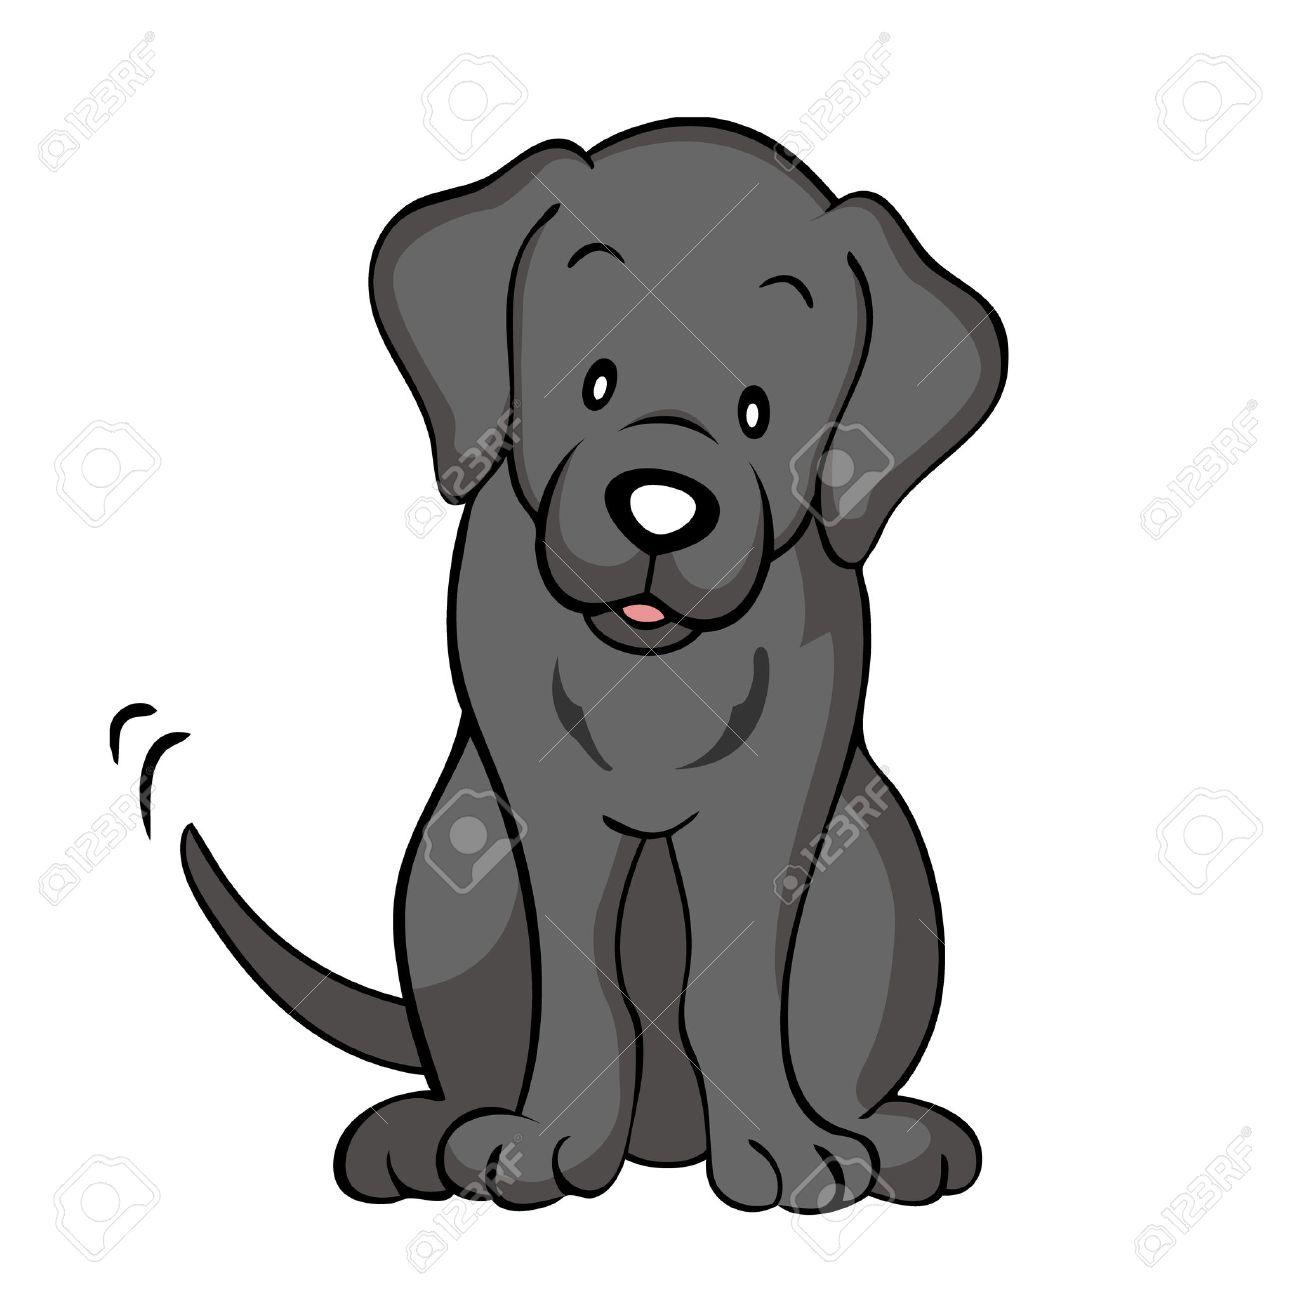 Black labrador dog isolated.